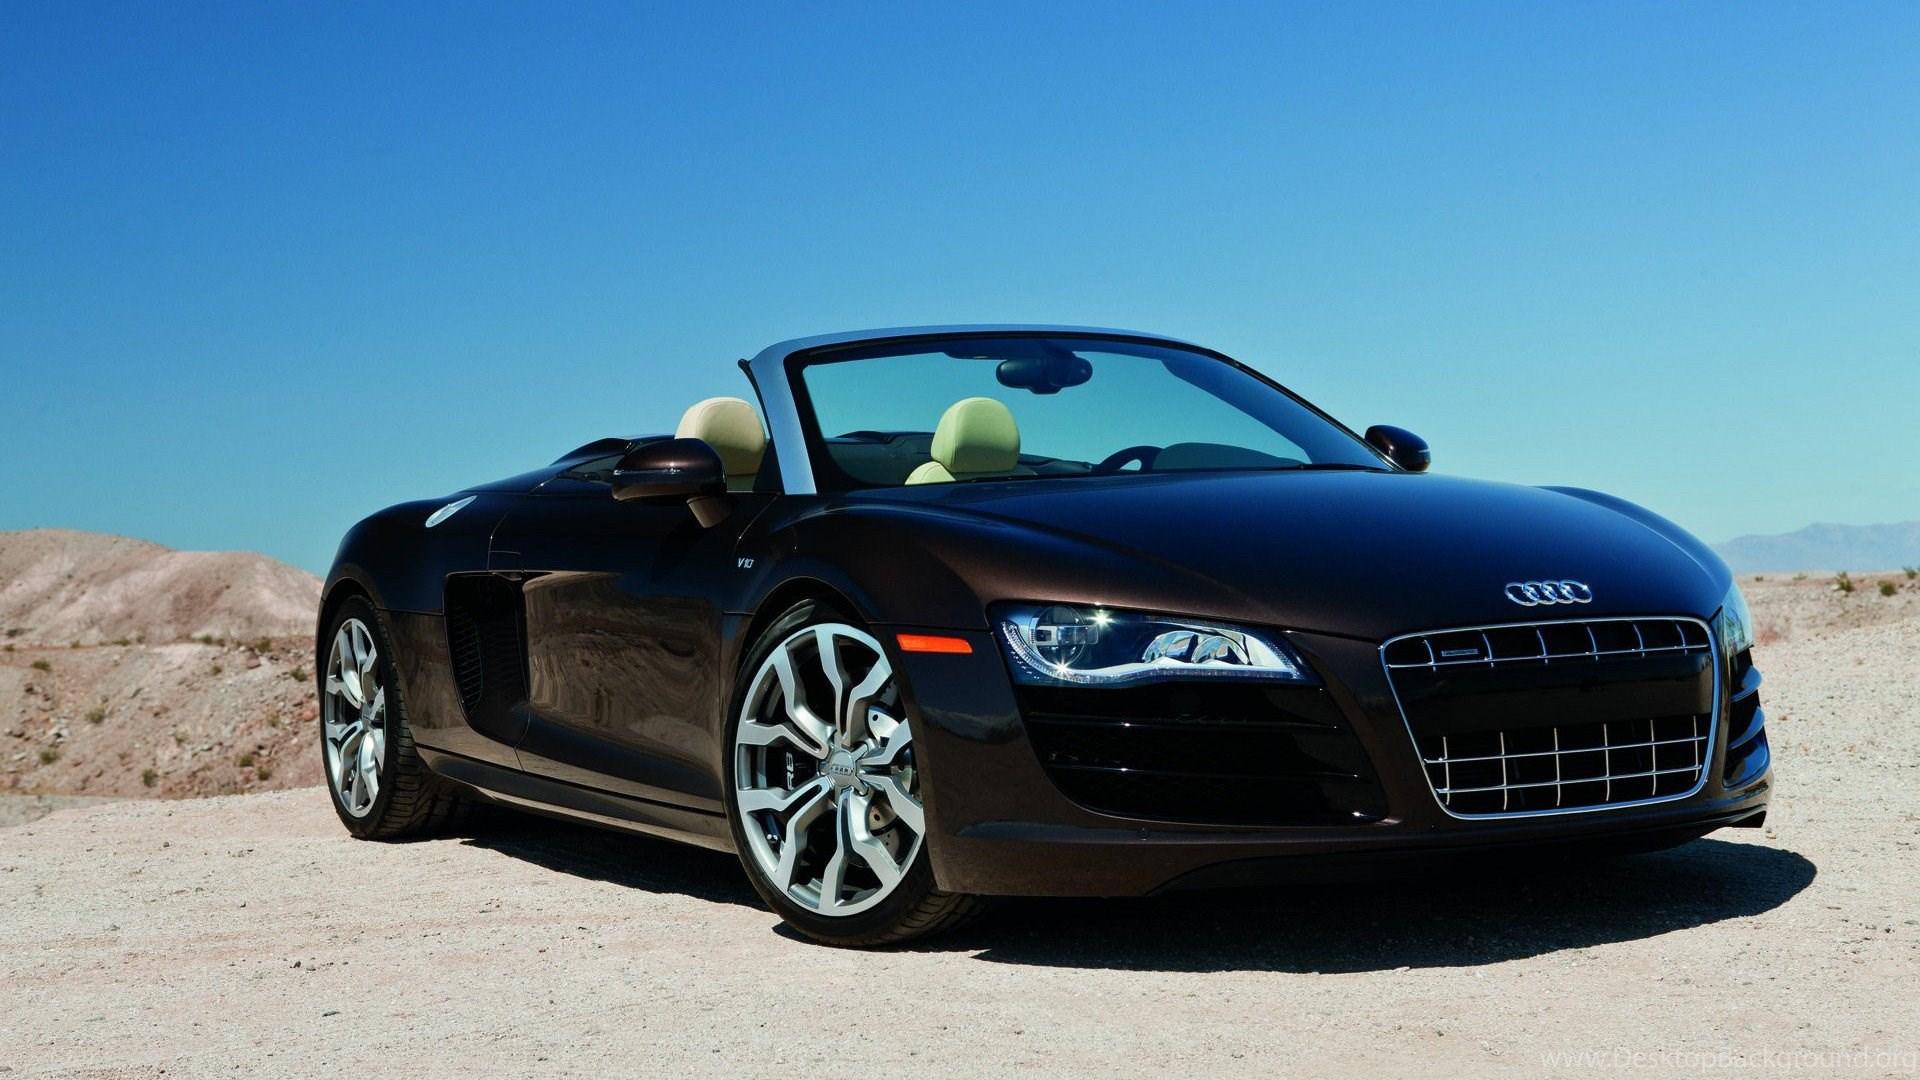 Audi Cars Full HD Wallpaper Images Pics For Mobile ...